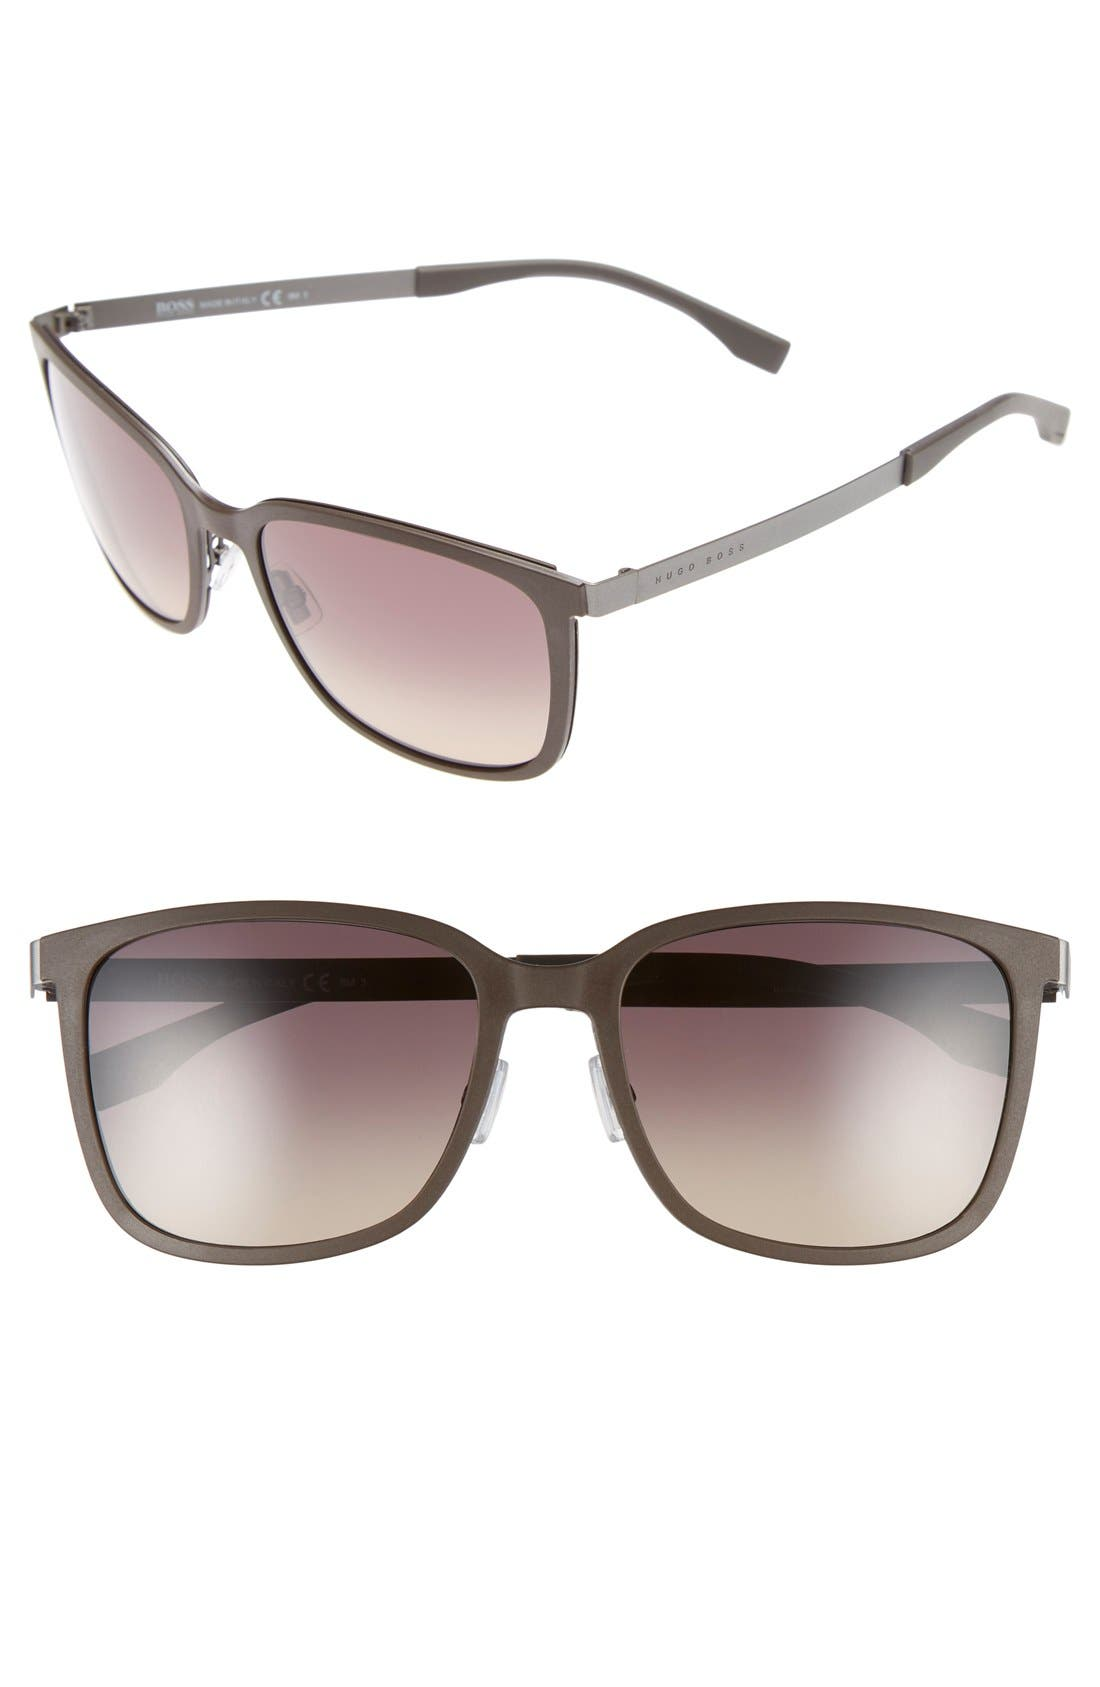 Alternate Image 1 Selected - BOSS 56mm Retro Sunglasses